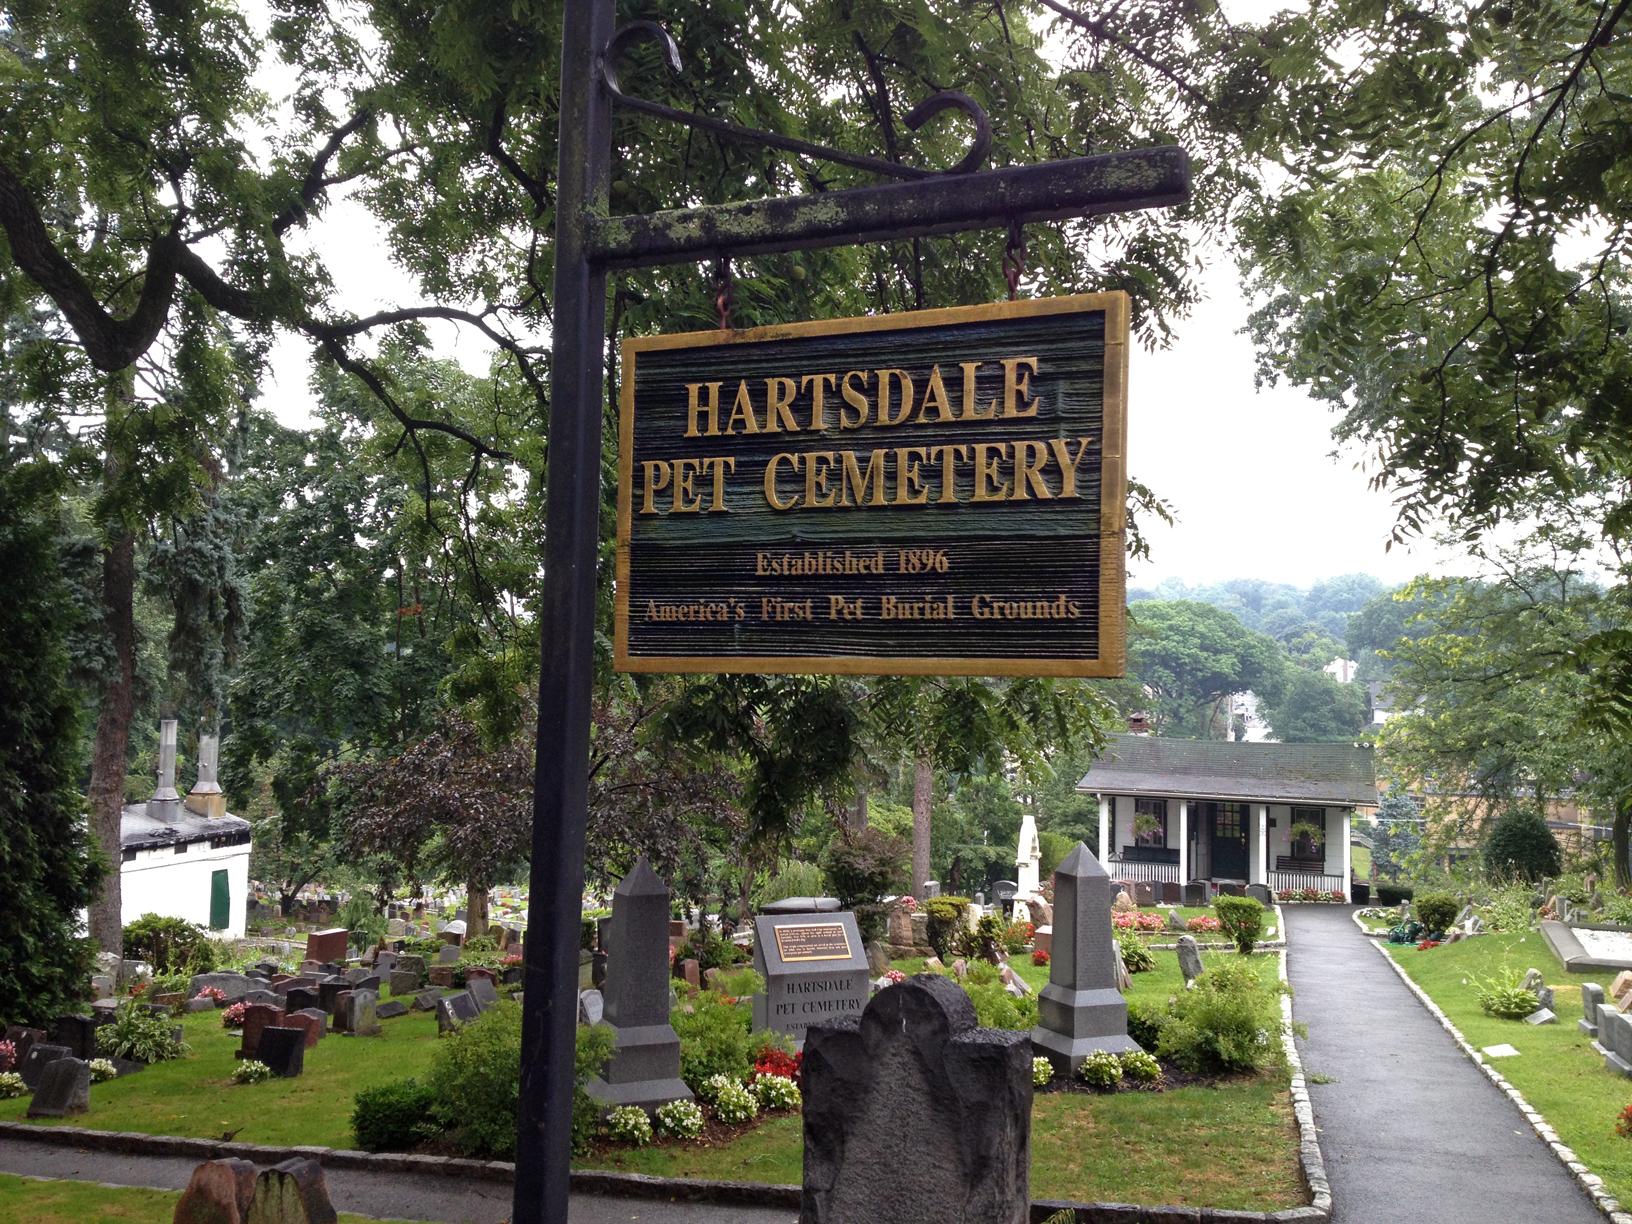 Hartsdale Pet Cemetery, War Dog Memorial, dog mausoleum